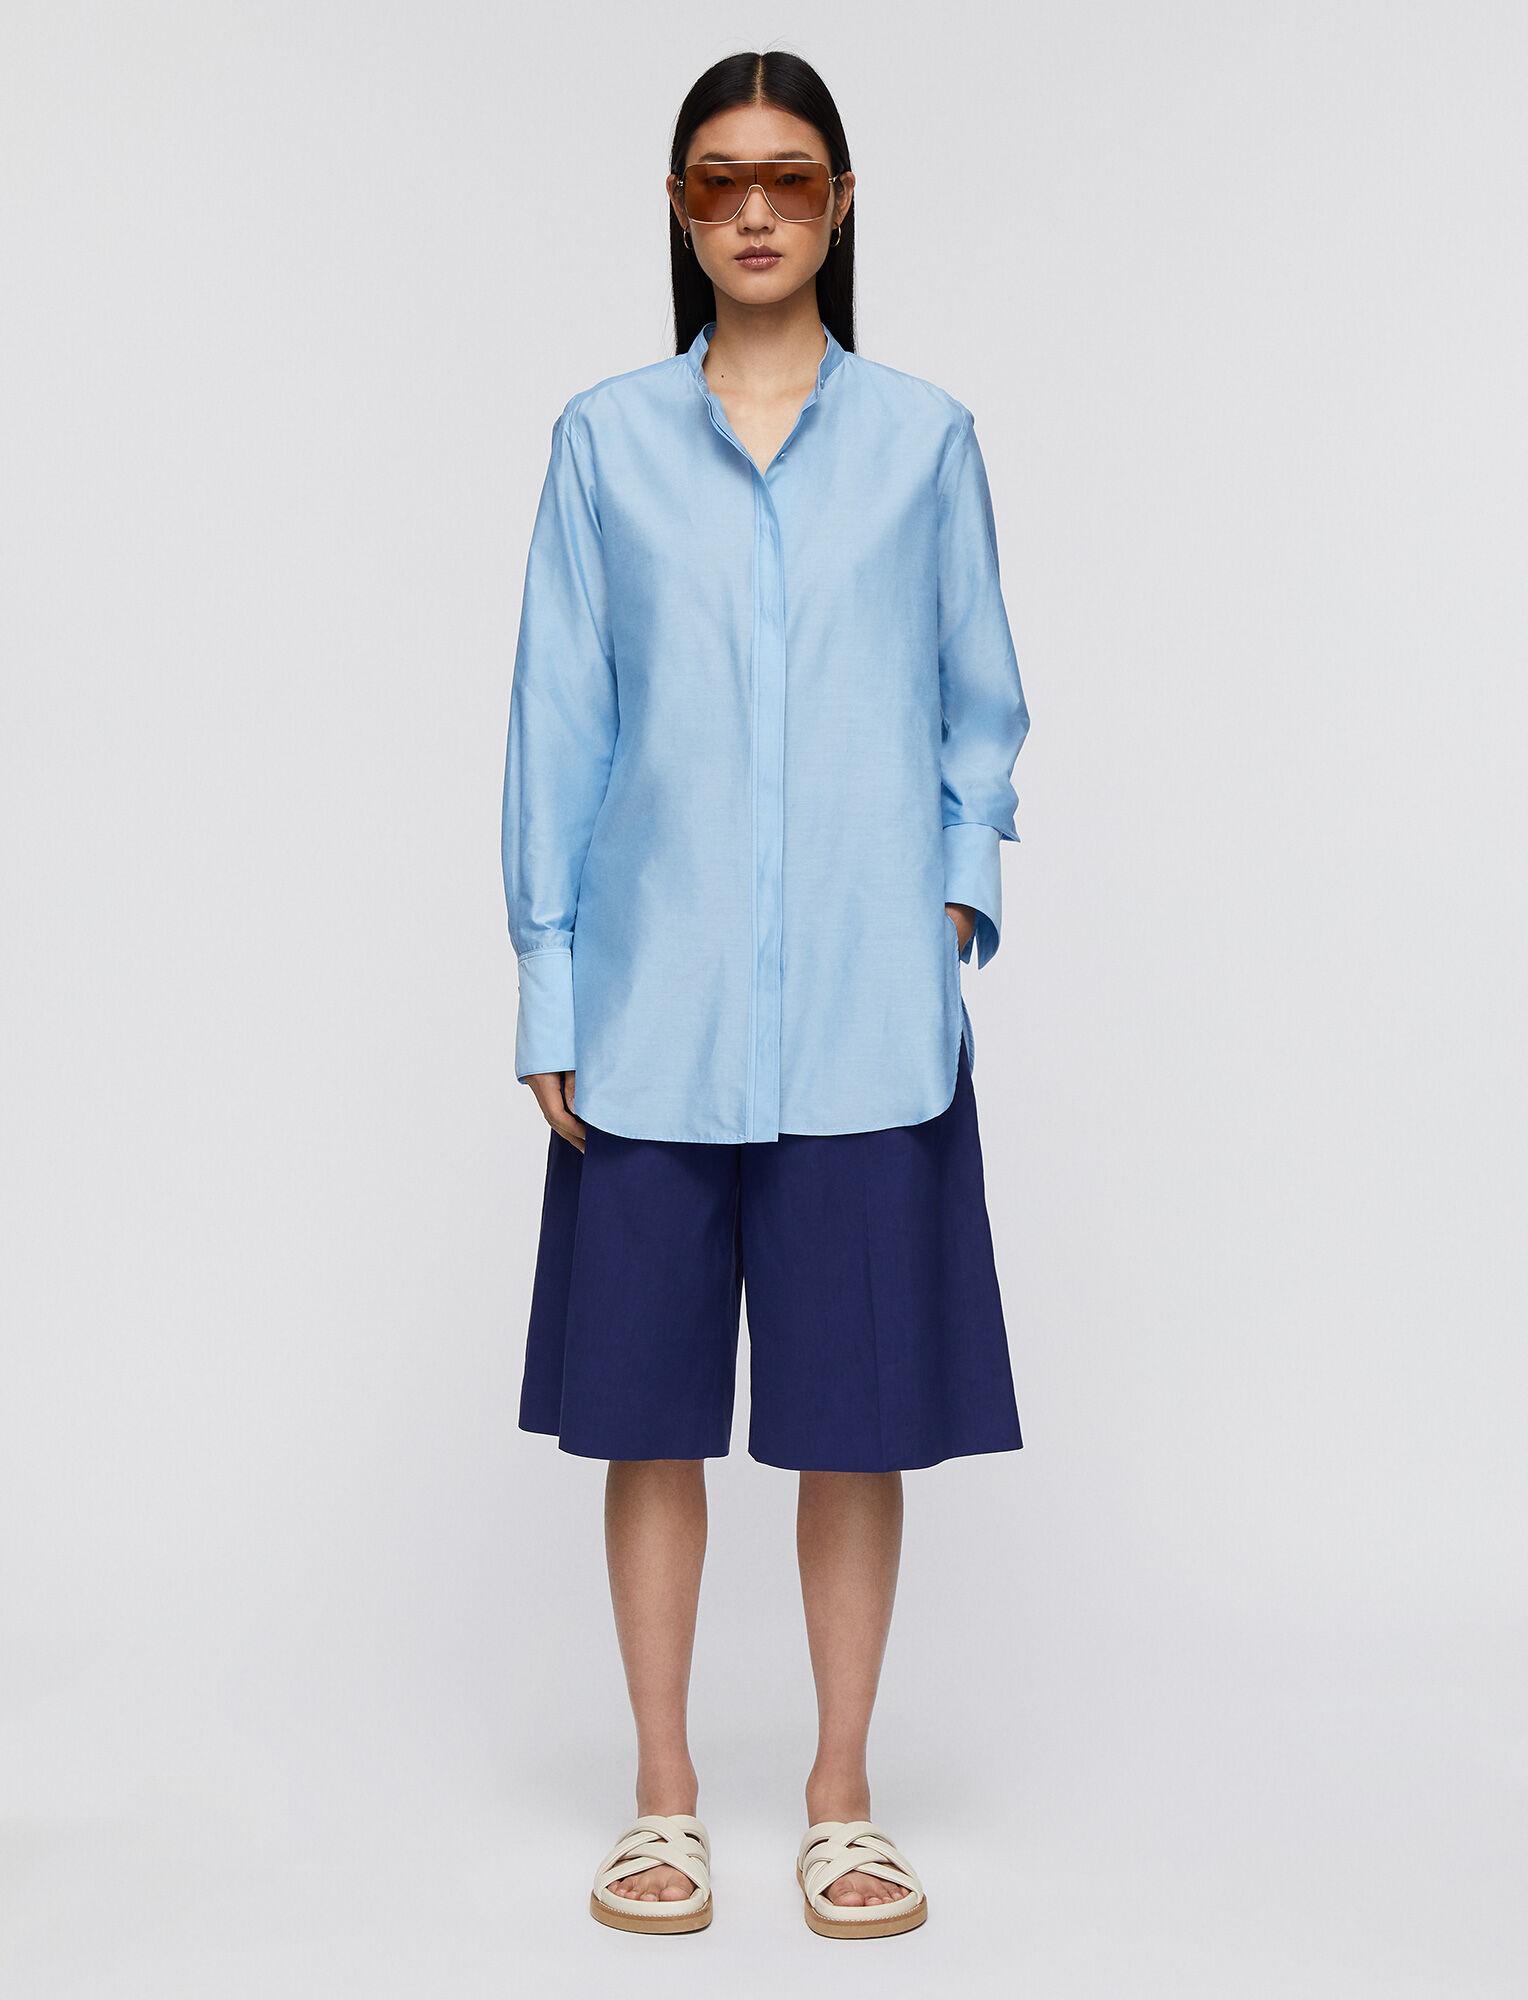 Joseph, Summer Silk Cotton Bratt Blouse, in CERULEAN